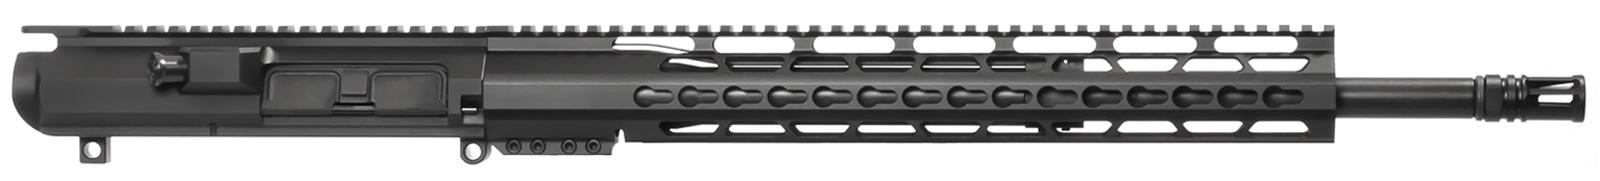 ar-10-upper-assembly-18-308-win-110-15-cbc-industries-keymod-ar-10-handguard-rail